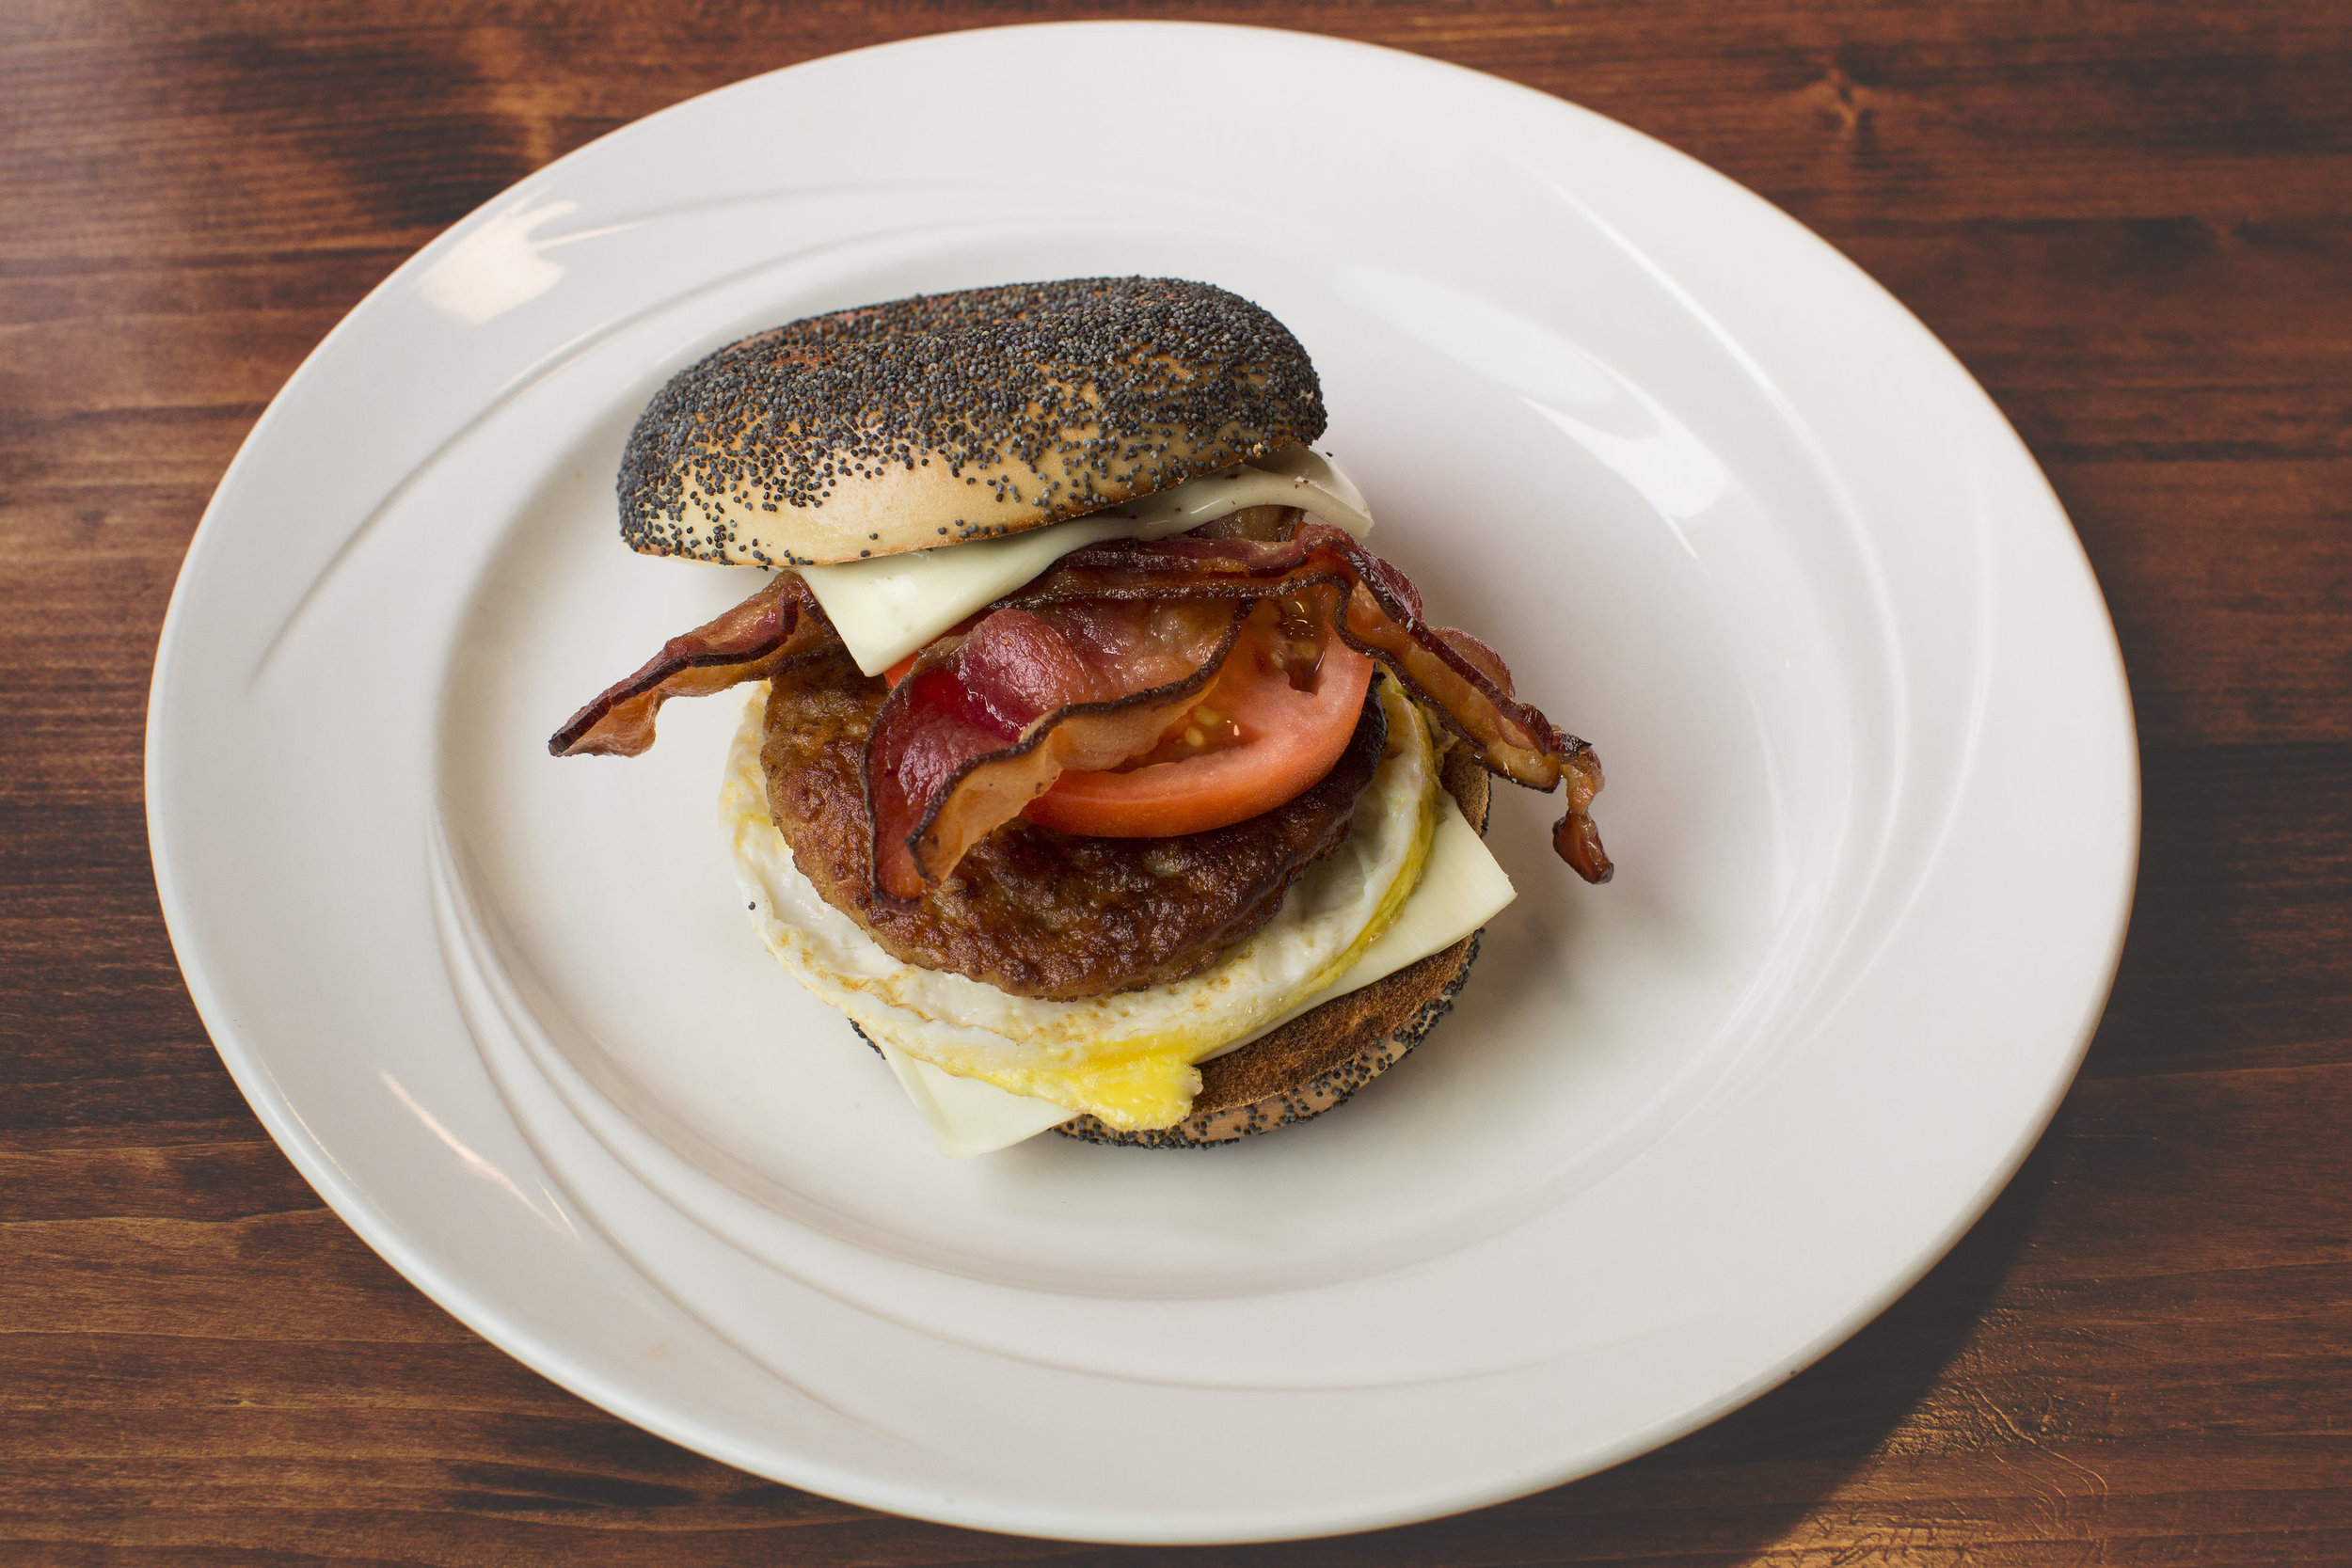 Bacon and Avocado Breakfast Sandwich